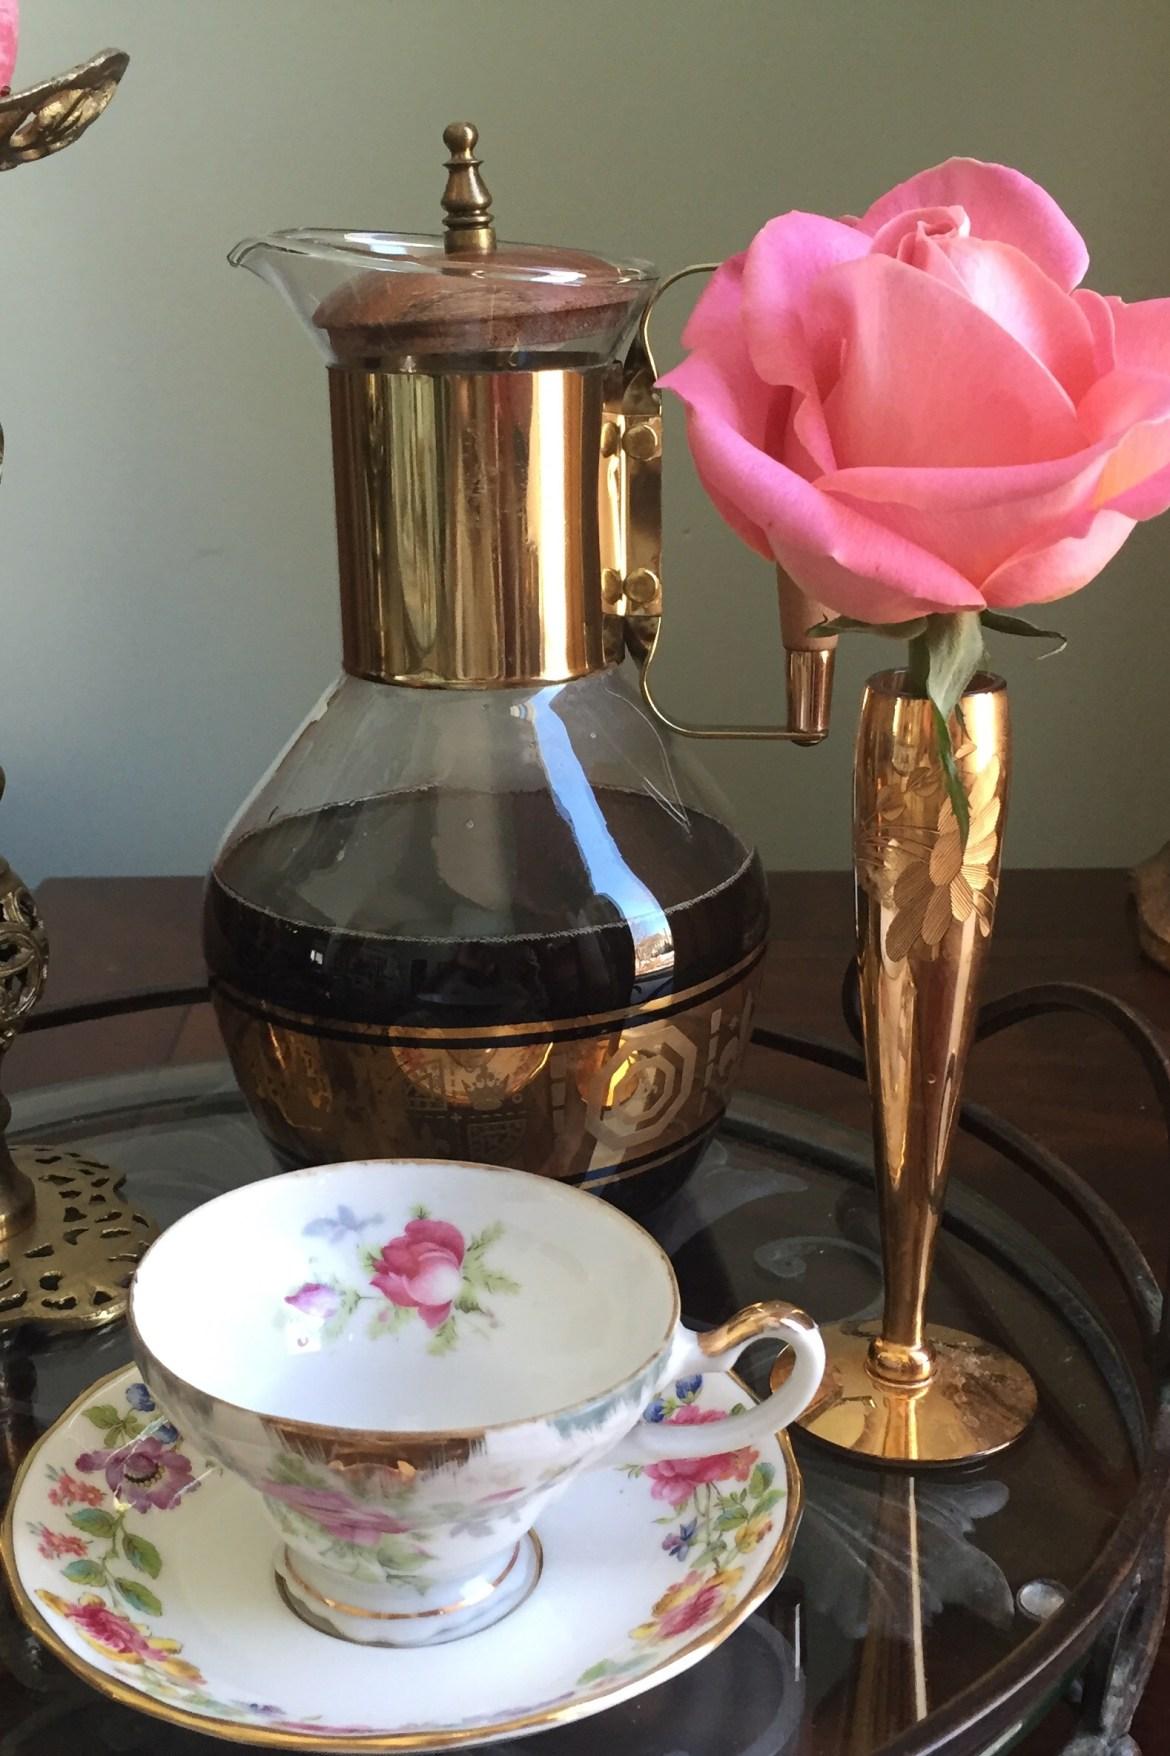 coffee caraffe and rose.jpg